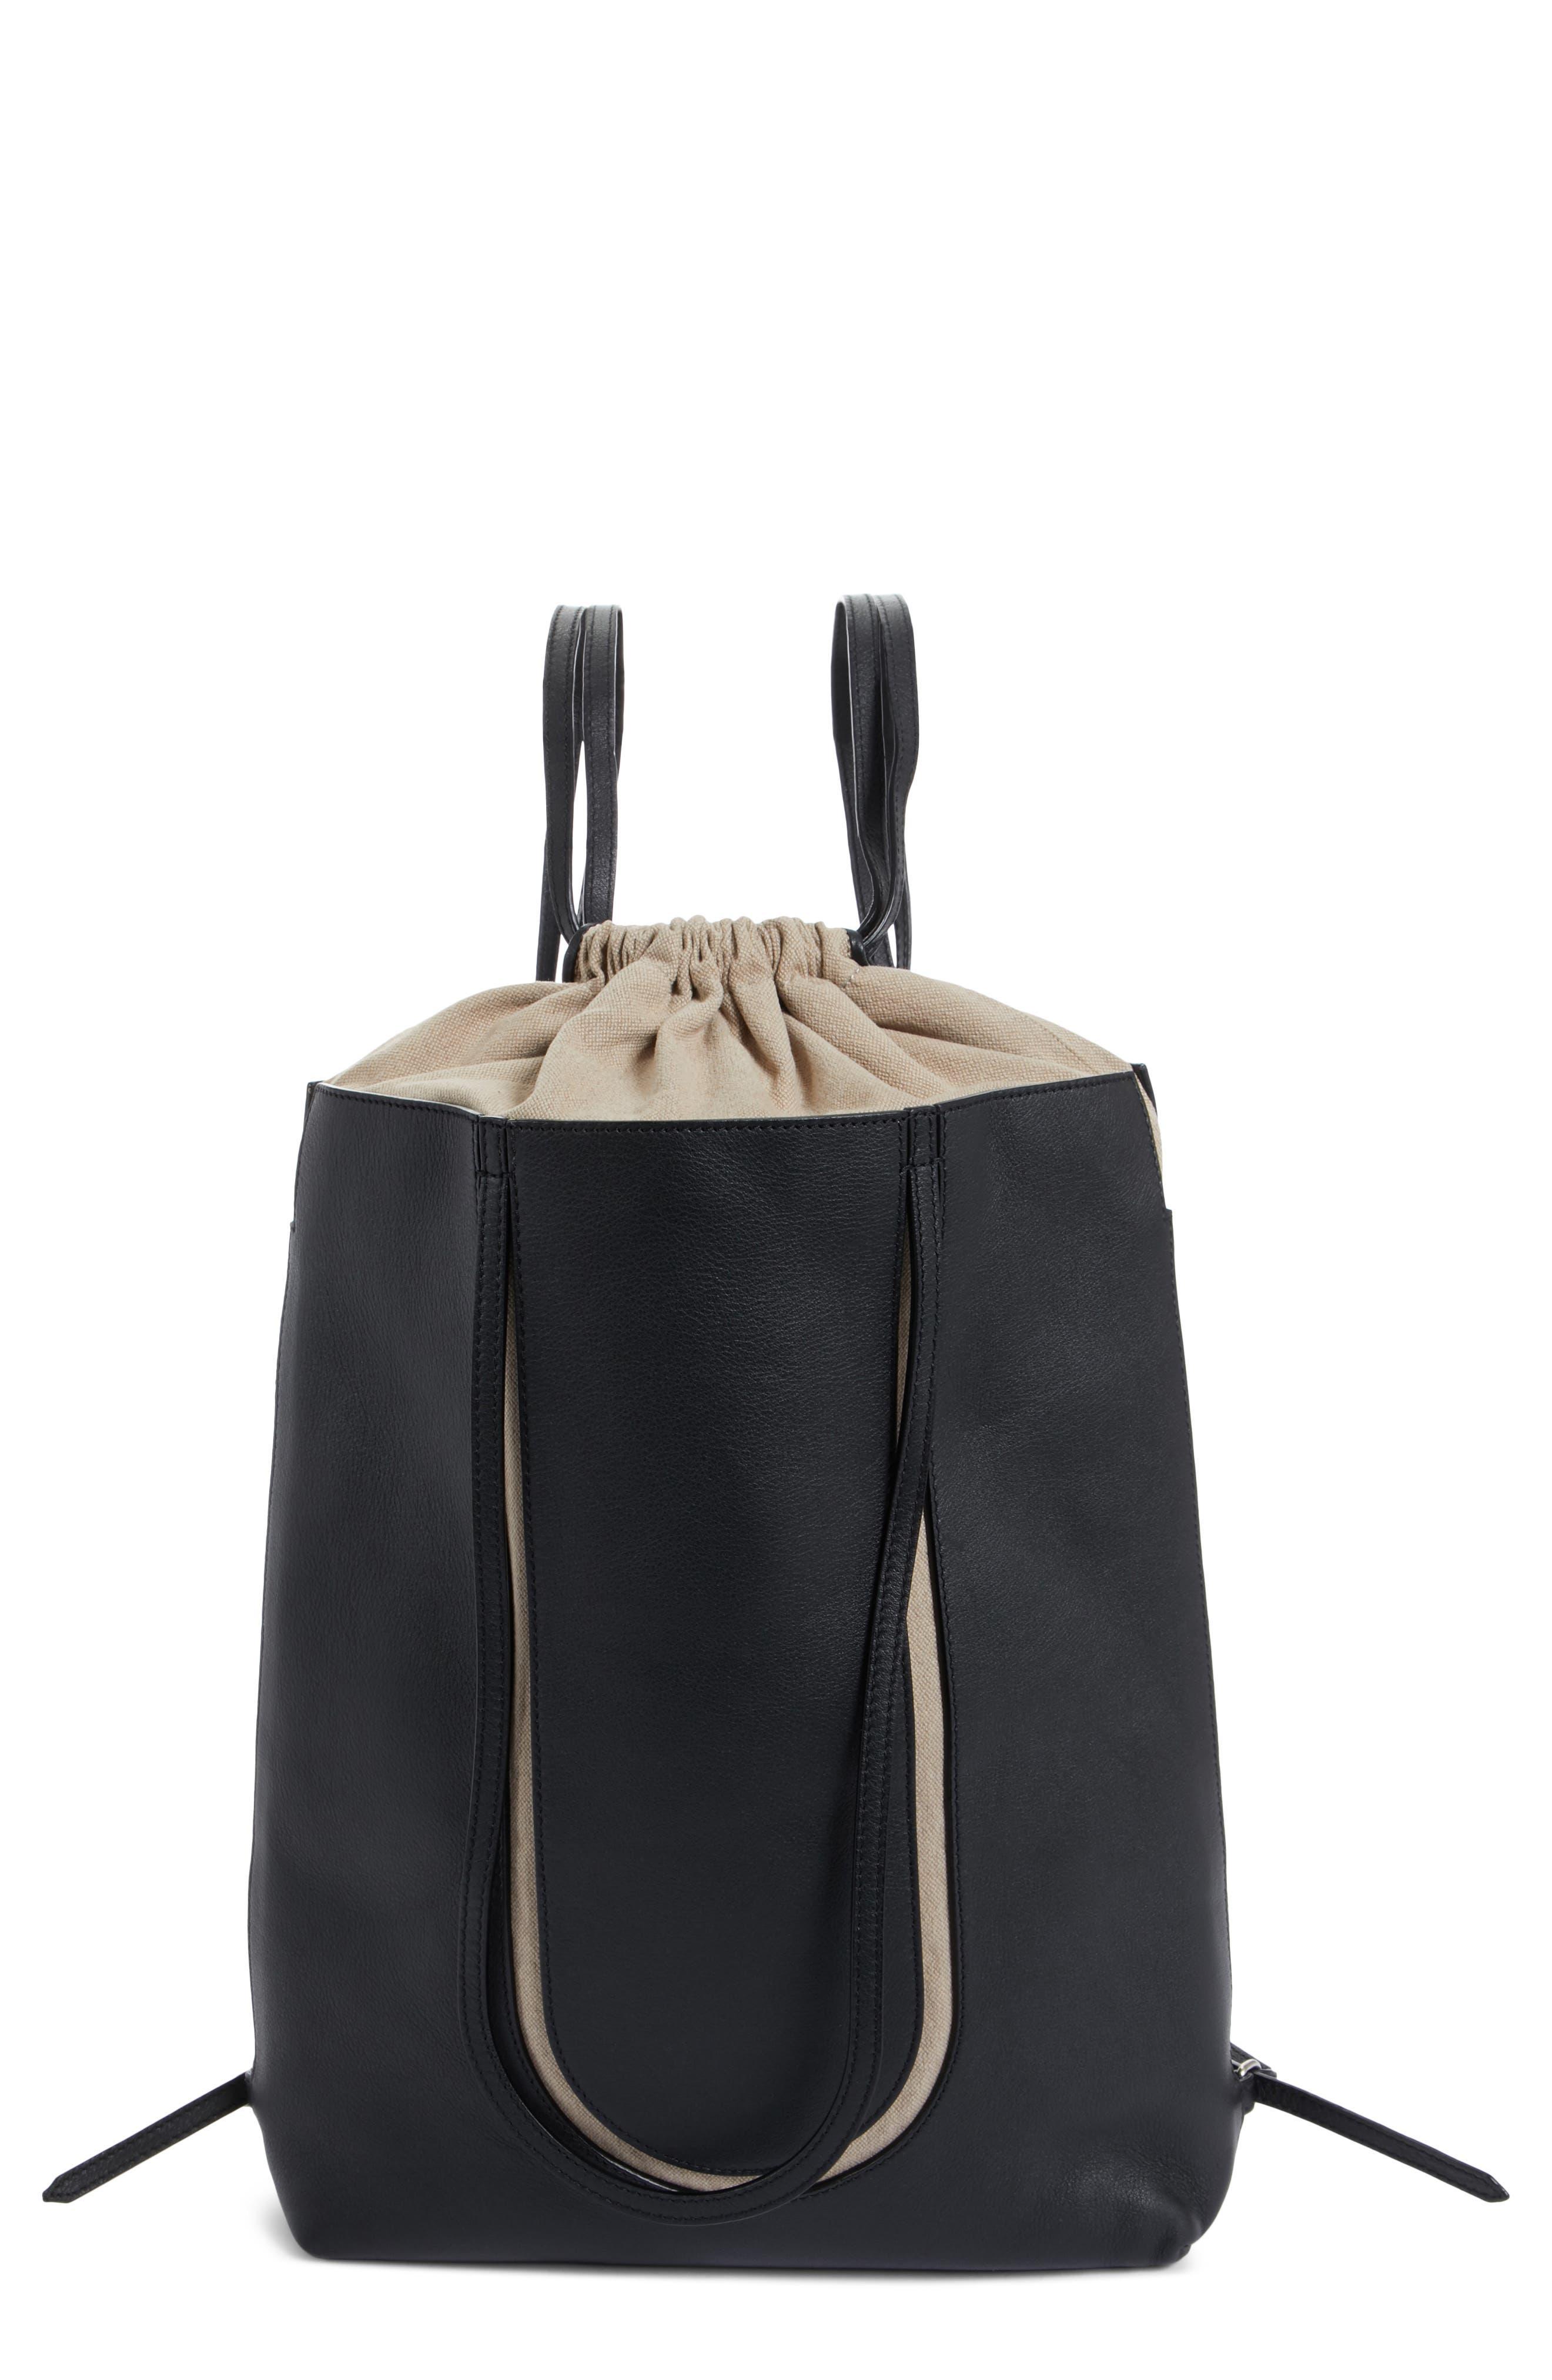 Calfskin Leather Backpack,                             Main thumbnail 1, color,                             Black